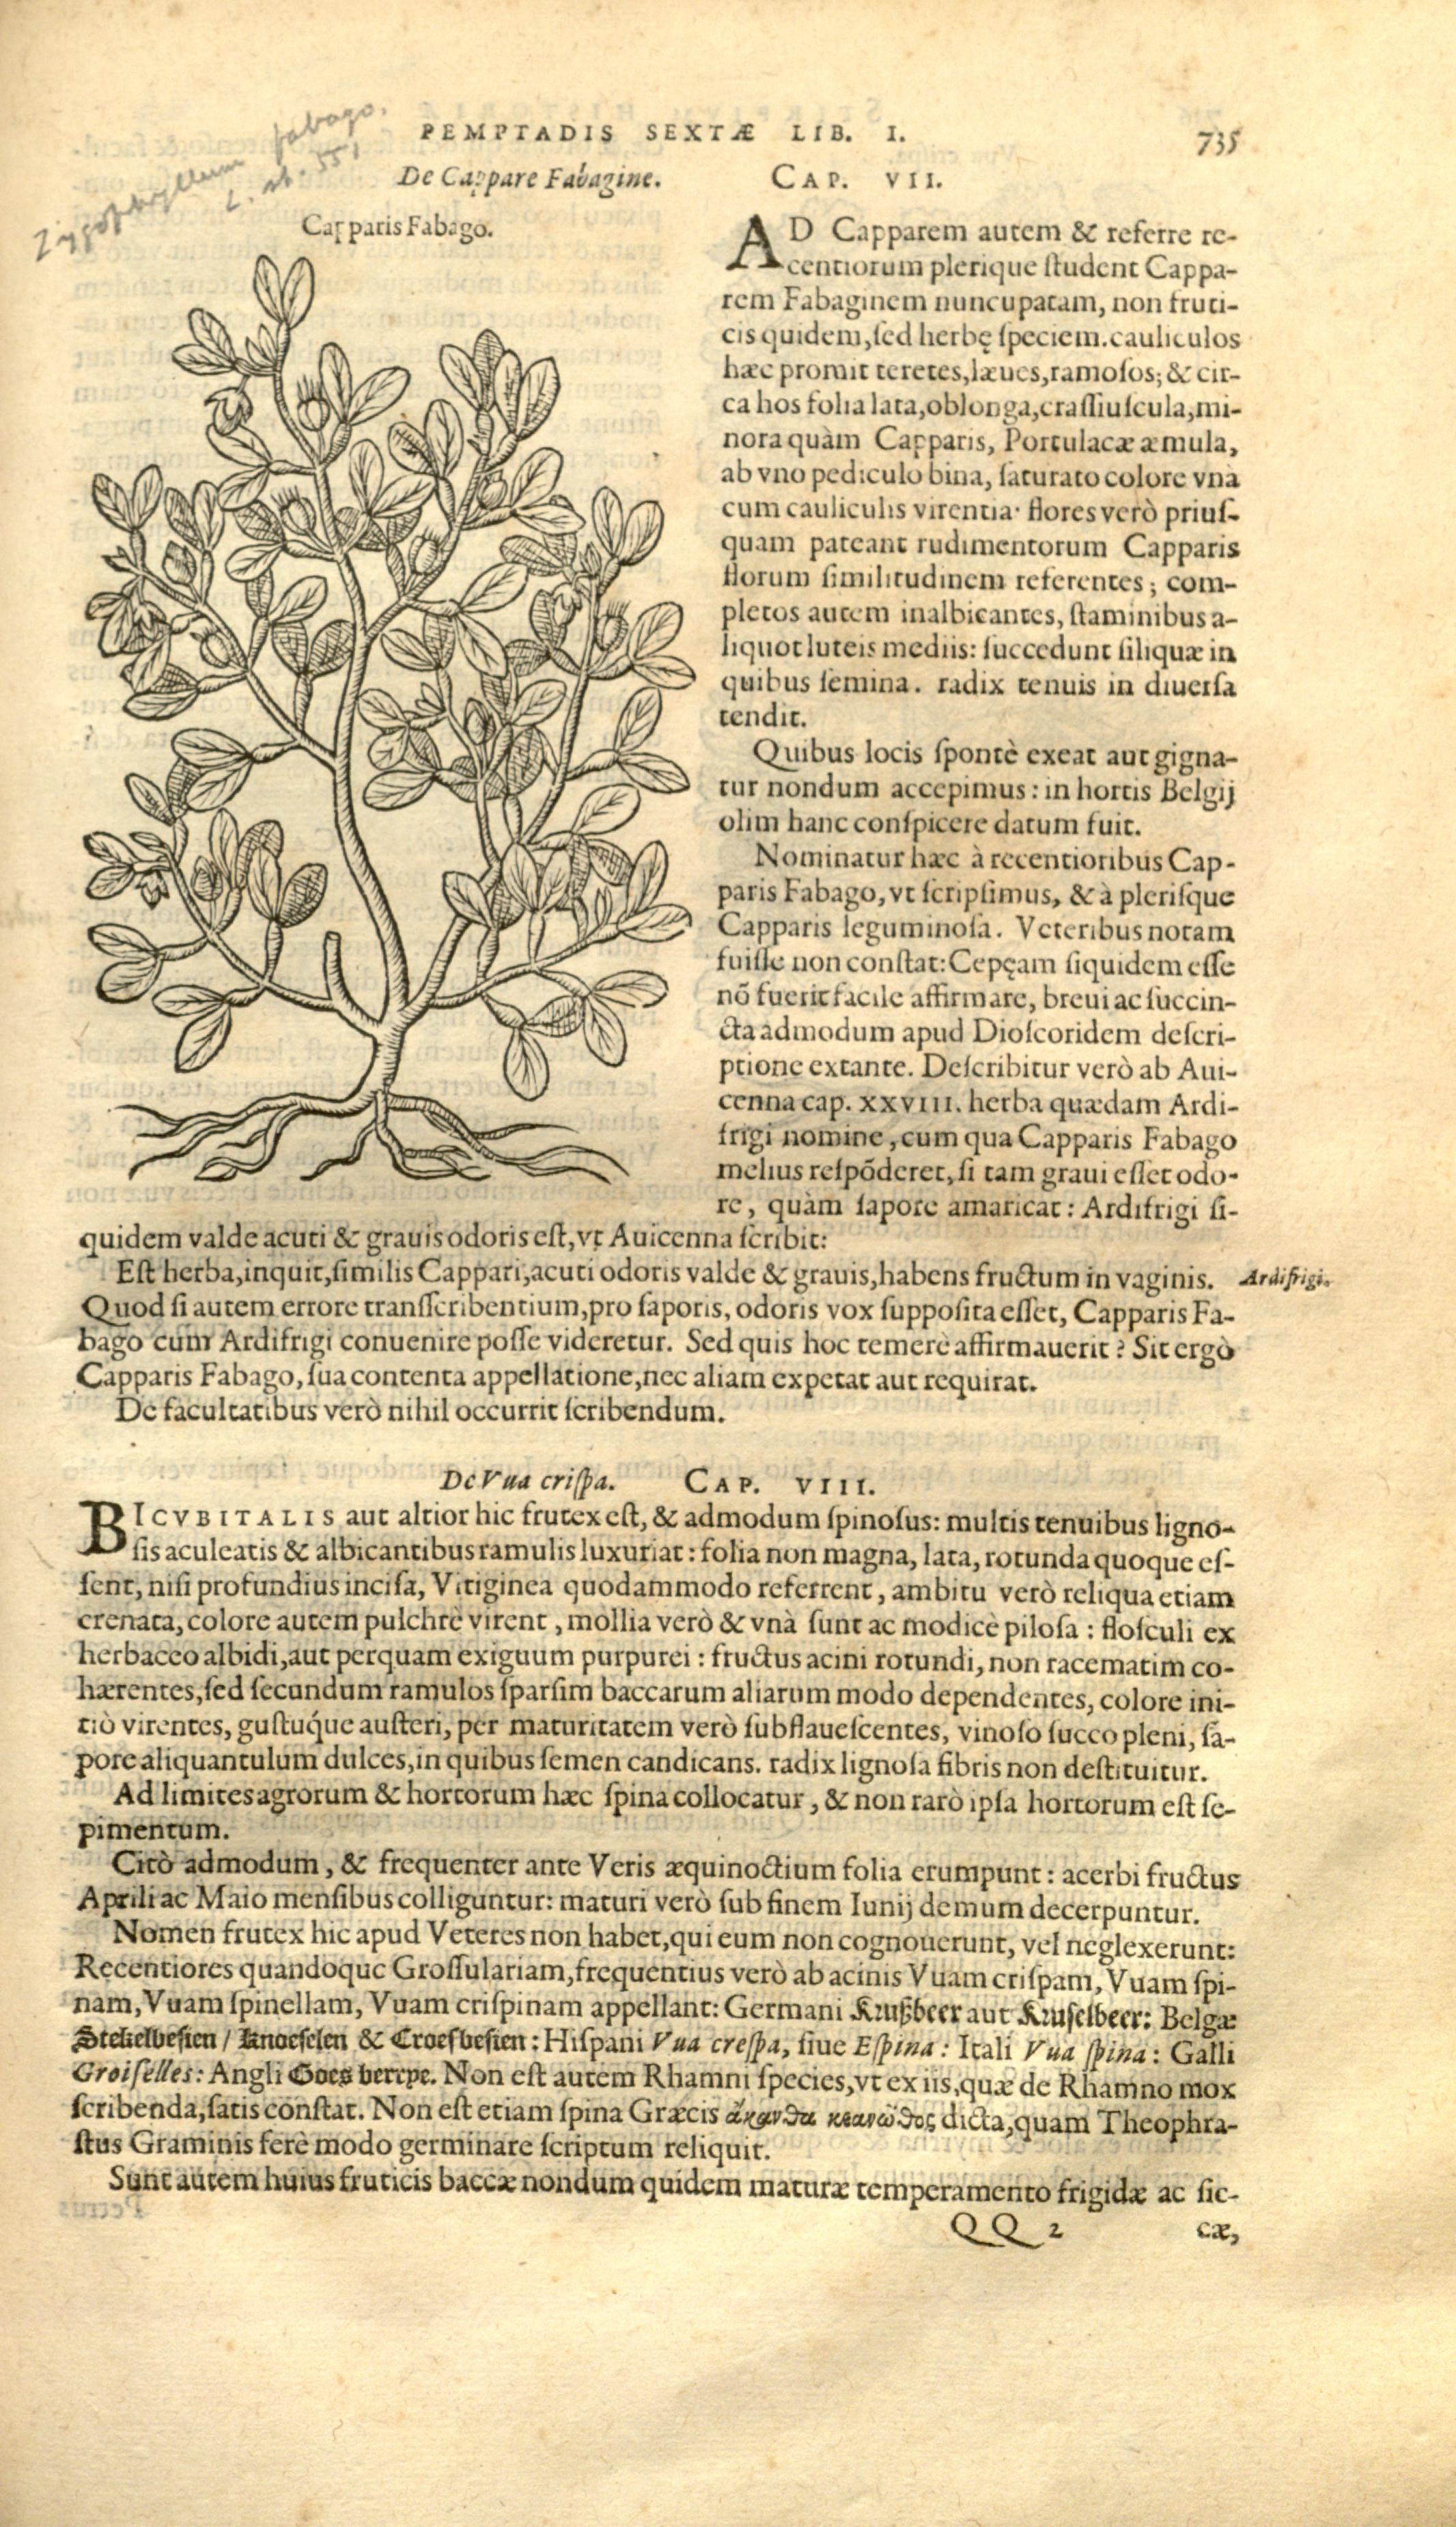 Stirpium historiae pemptades sex, sive libri XXX (Page 735) BHL8100391.jpg Remberti Dodonaei ... Stirpium historiae pemptades sex, sive libri XXX. Date 1583